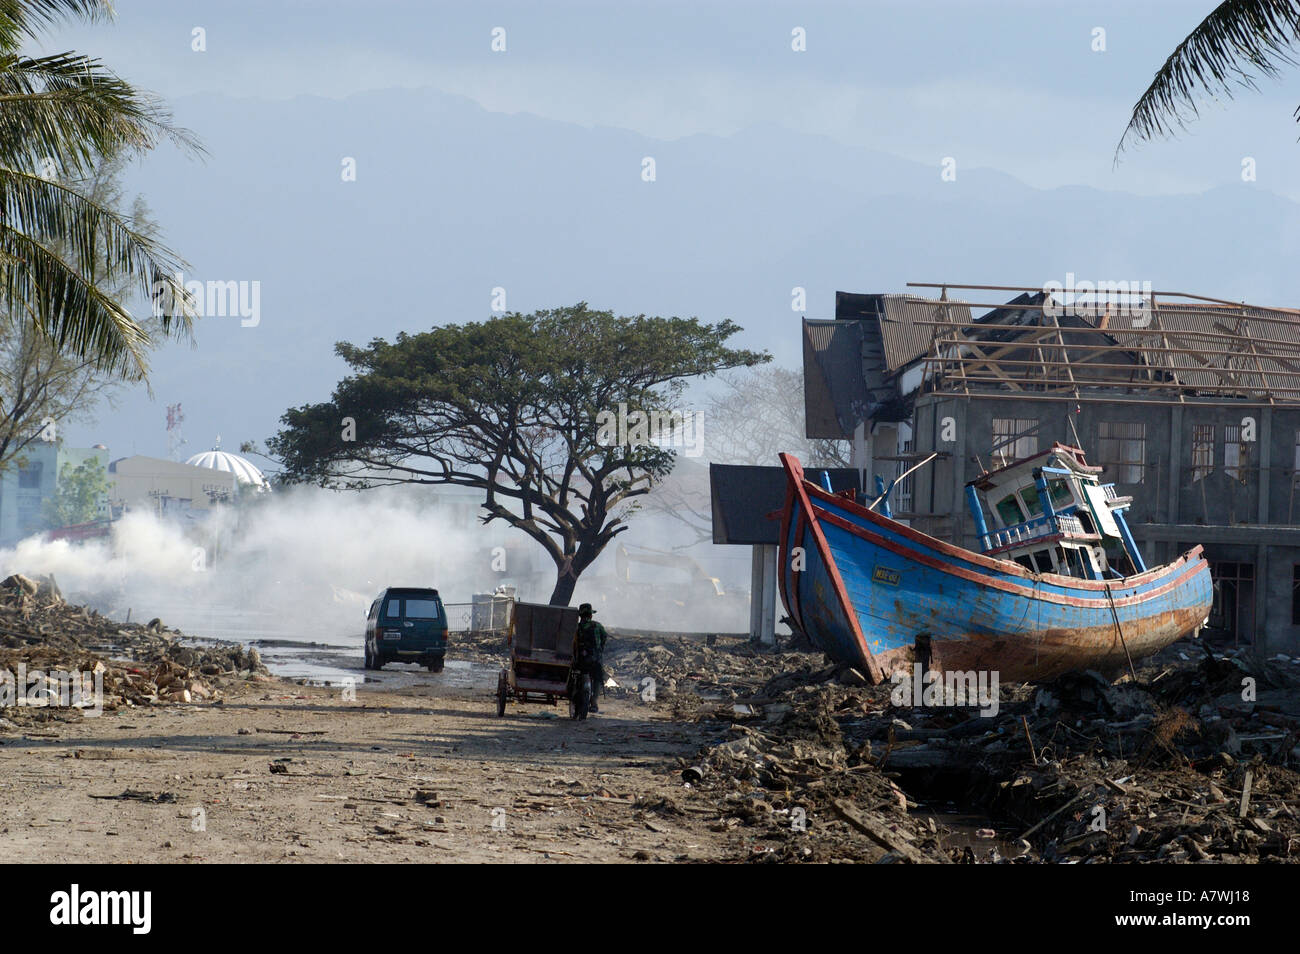 Indonesia Sumatra Banda Aceh Post Tsunami Stranded Boat In City Centre Stock Photo Alamy